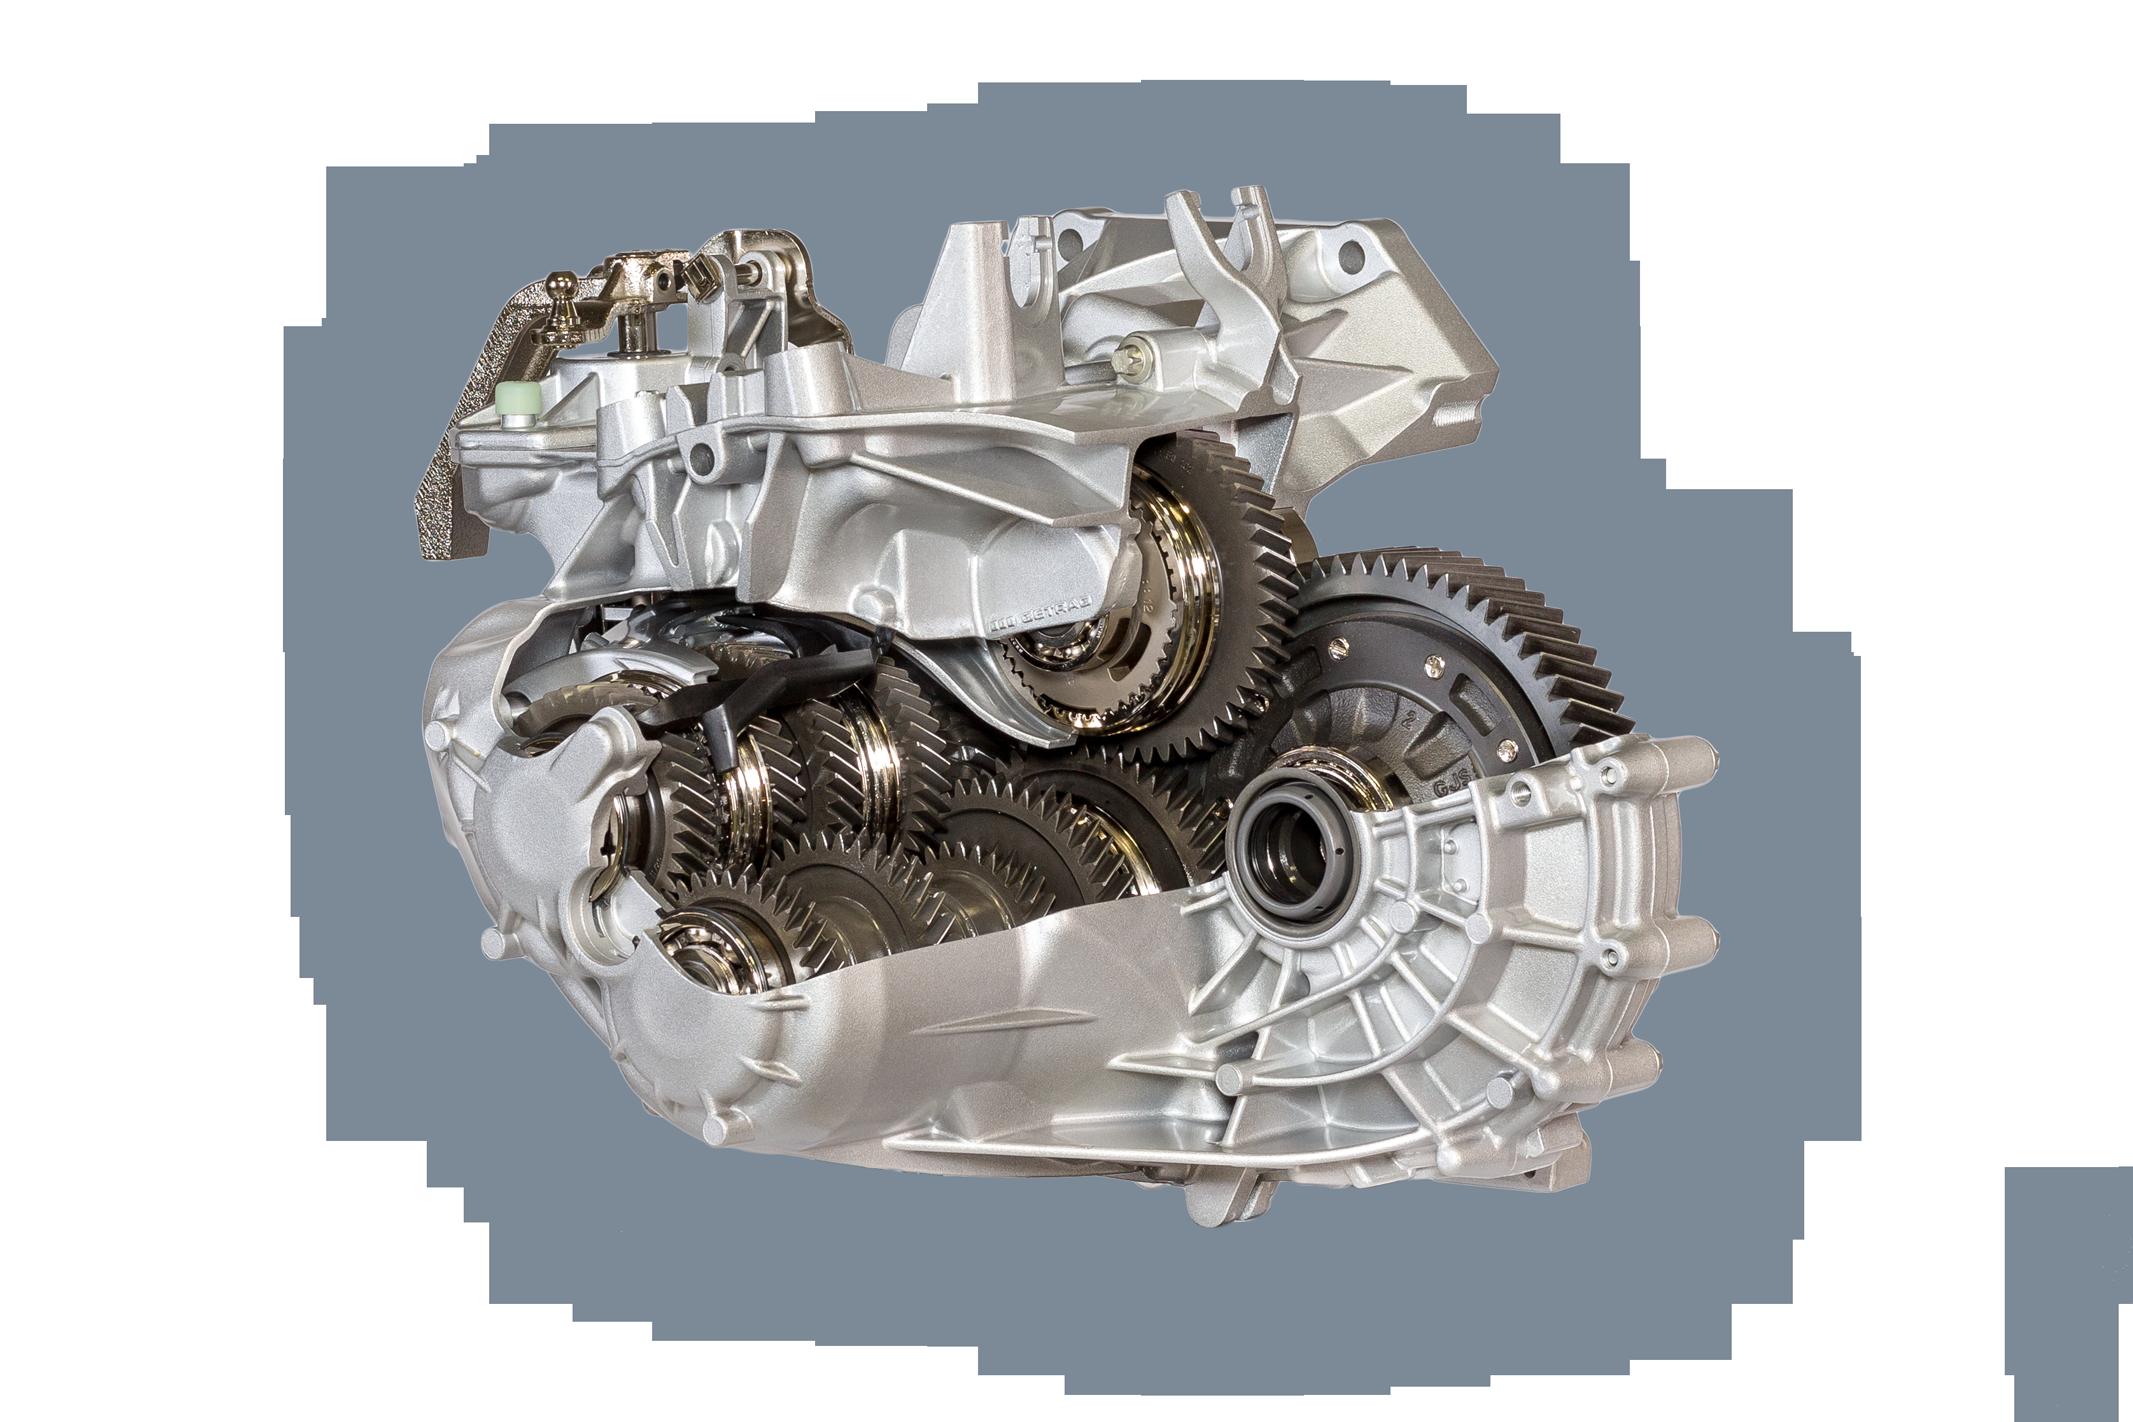 6MTT350 gearbox by Getrag